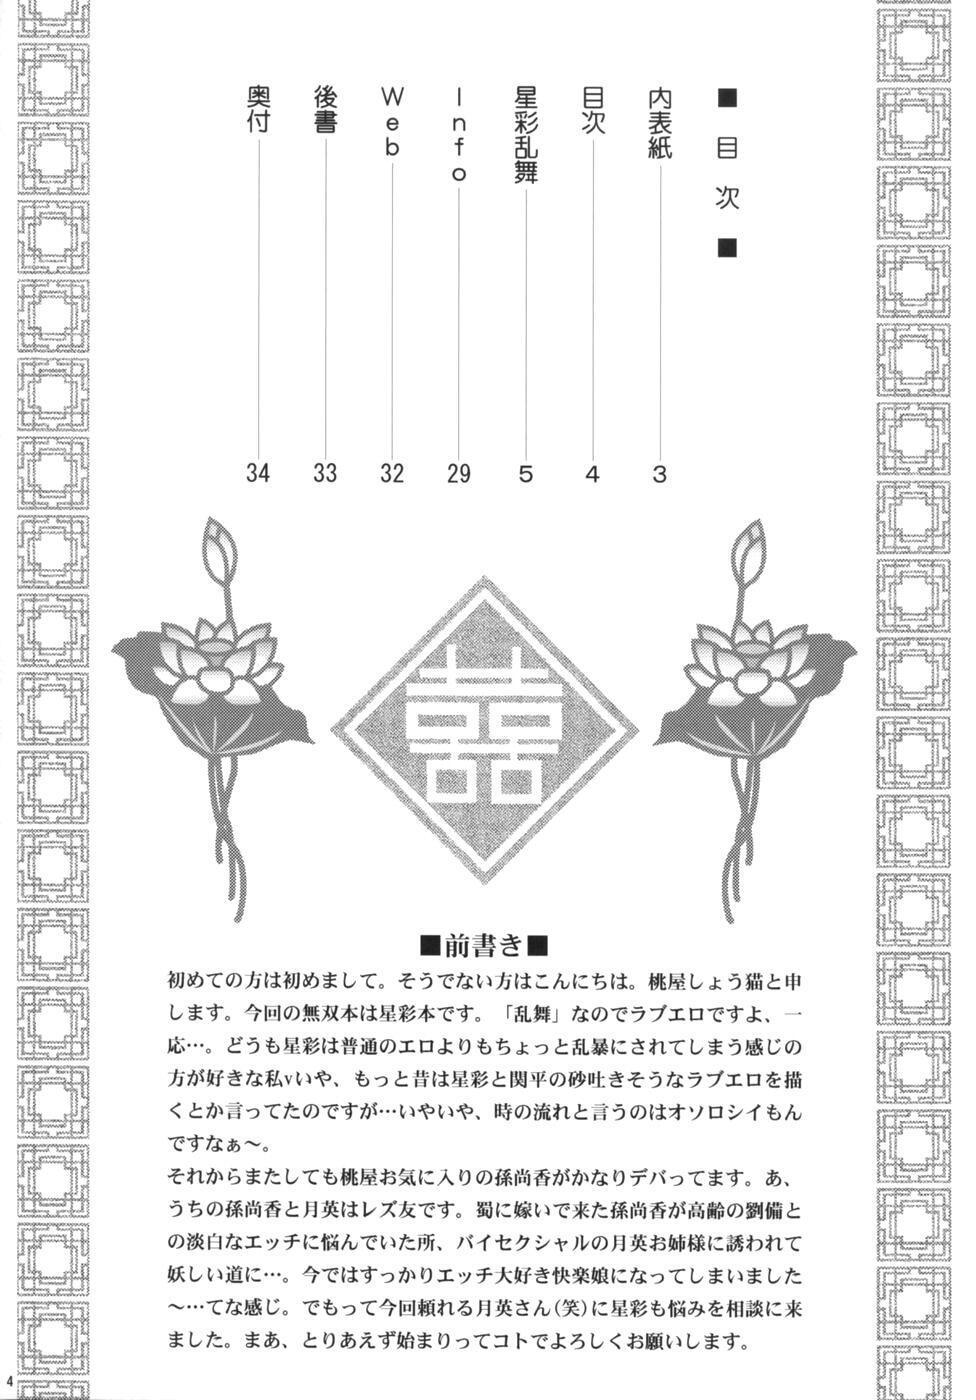 Seisai Ranbu | Xing Cai Ranbu 2